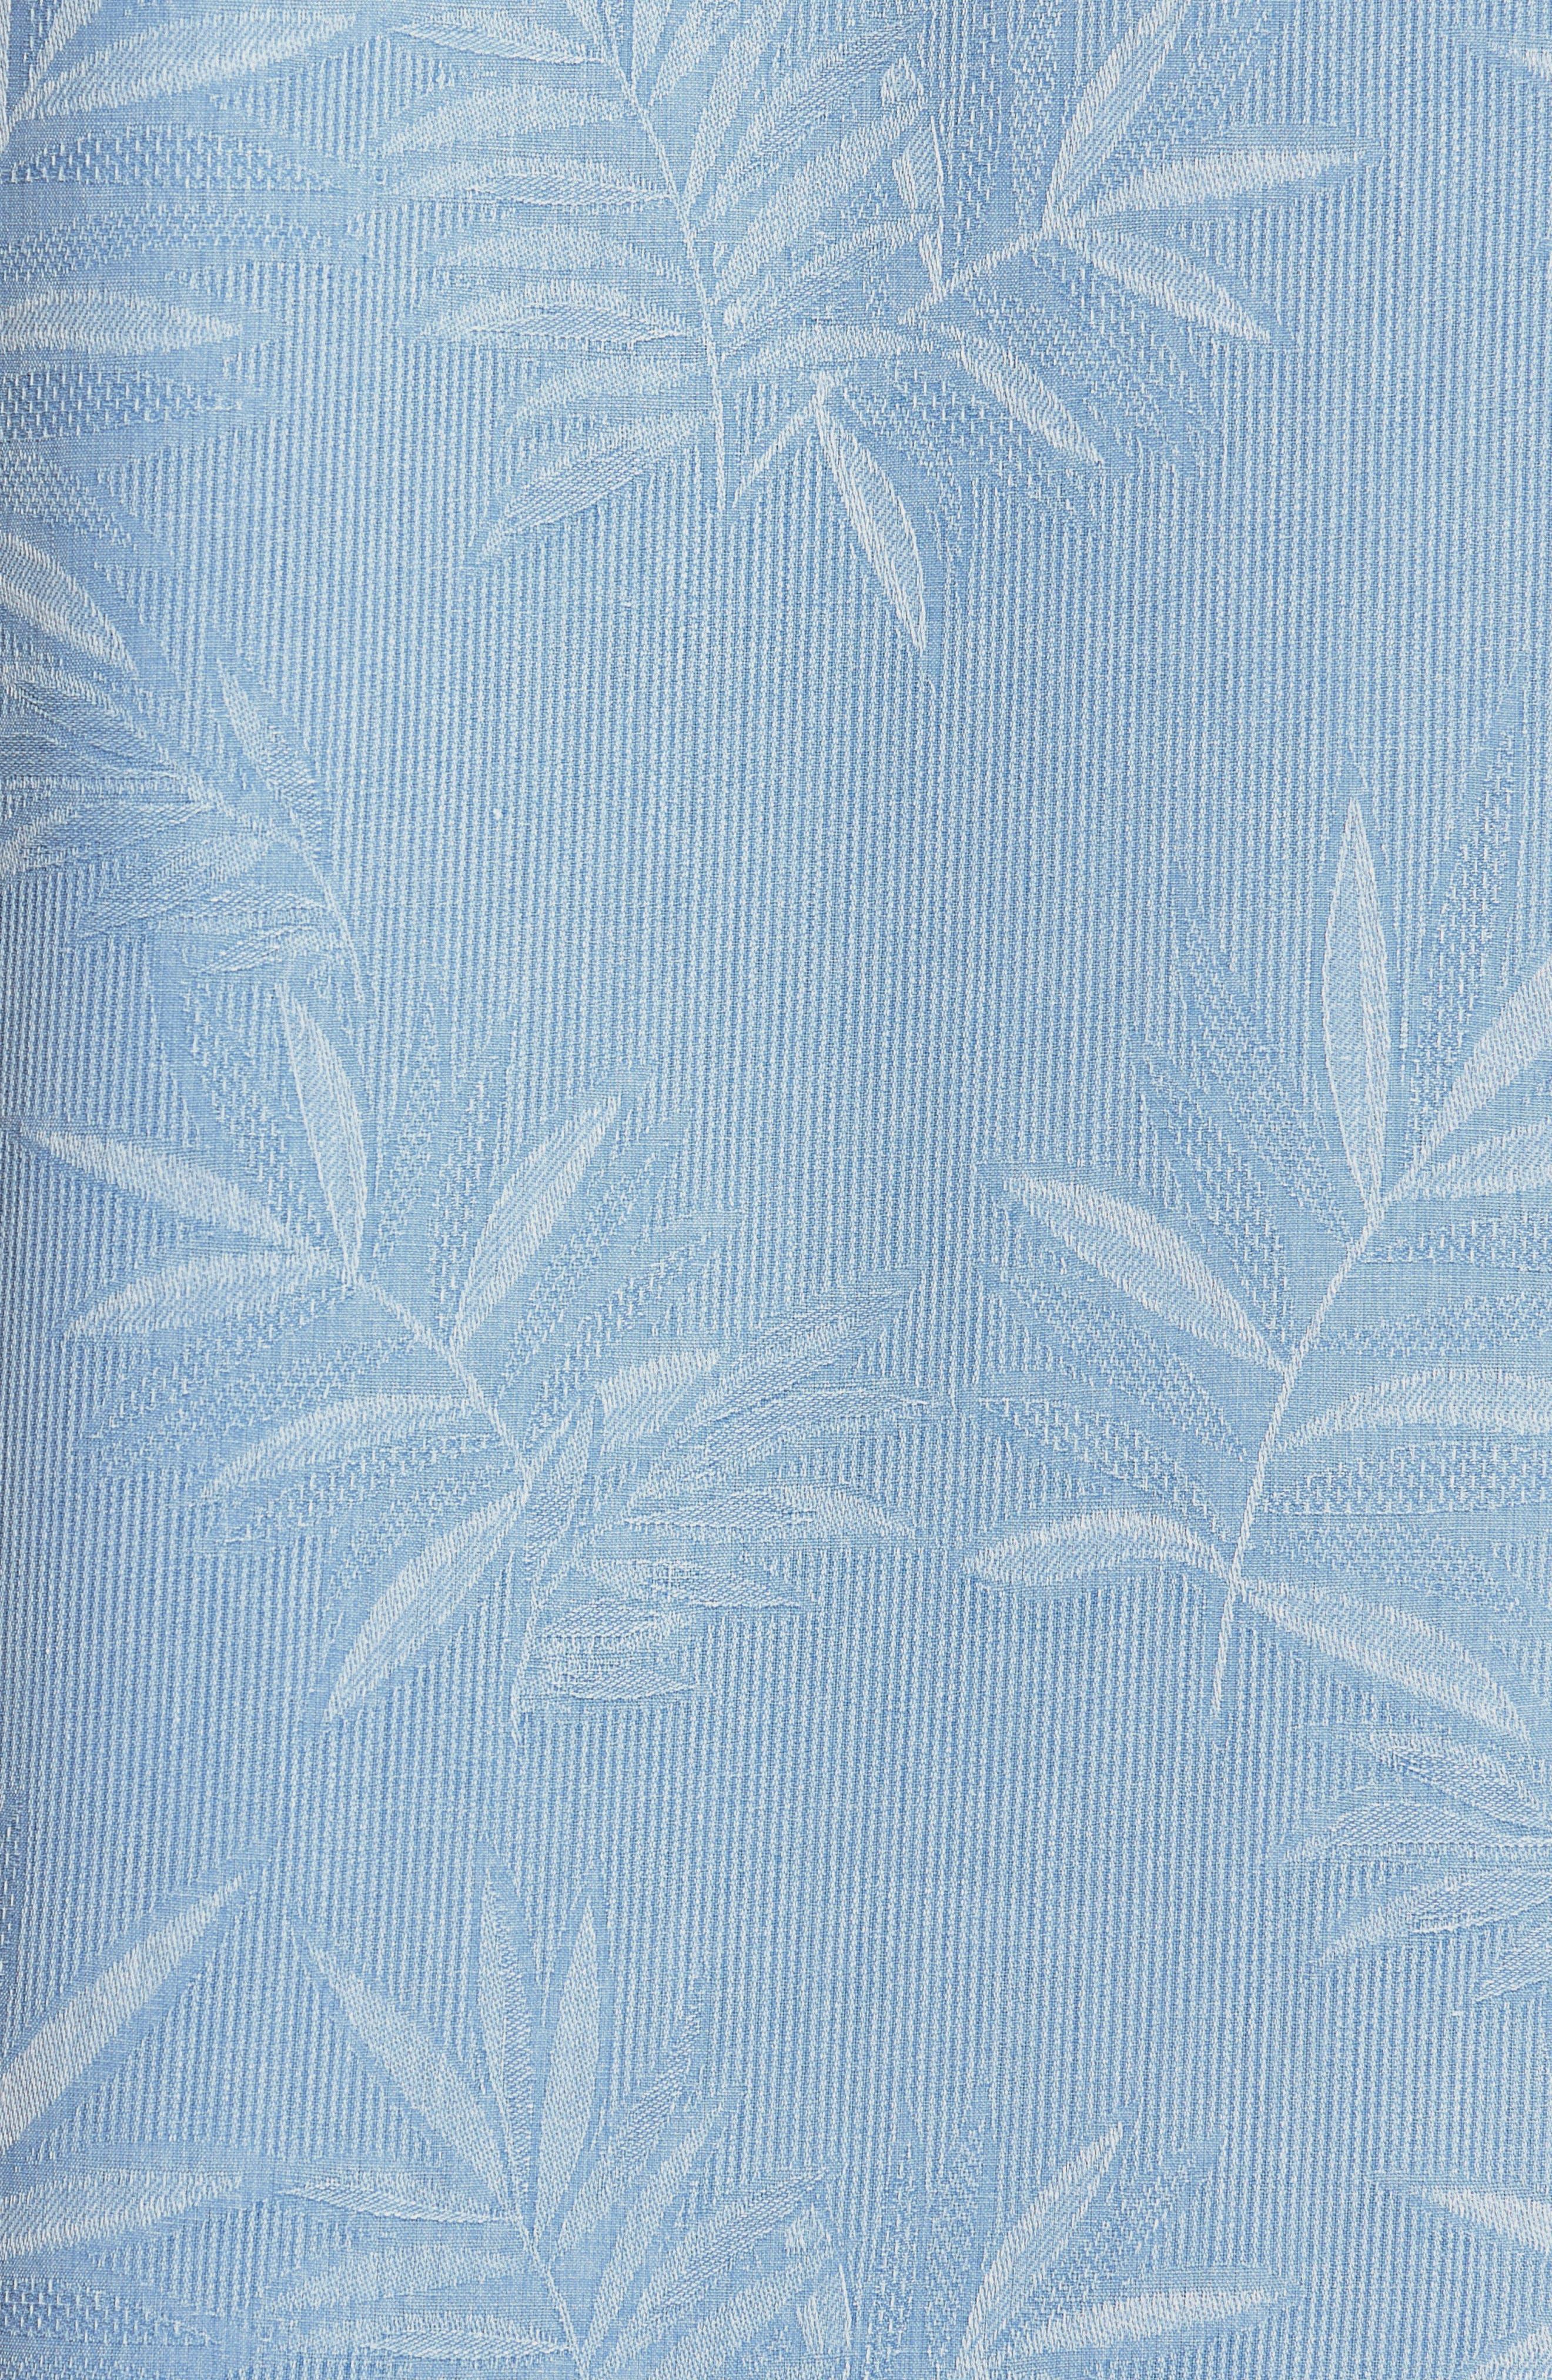 Luau Floral Silk Shirt,                             Alternate thumbnail 5, color,                             LIGHT SKY